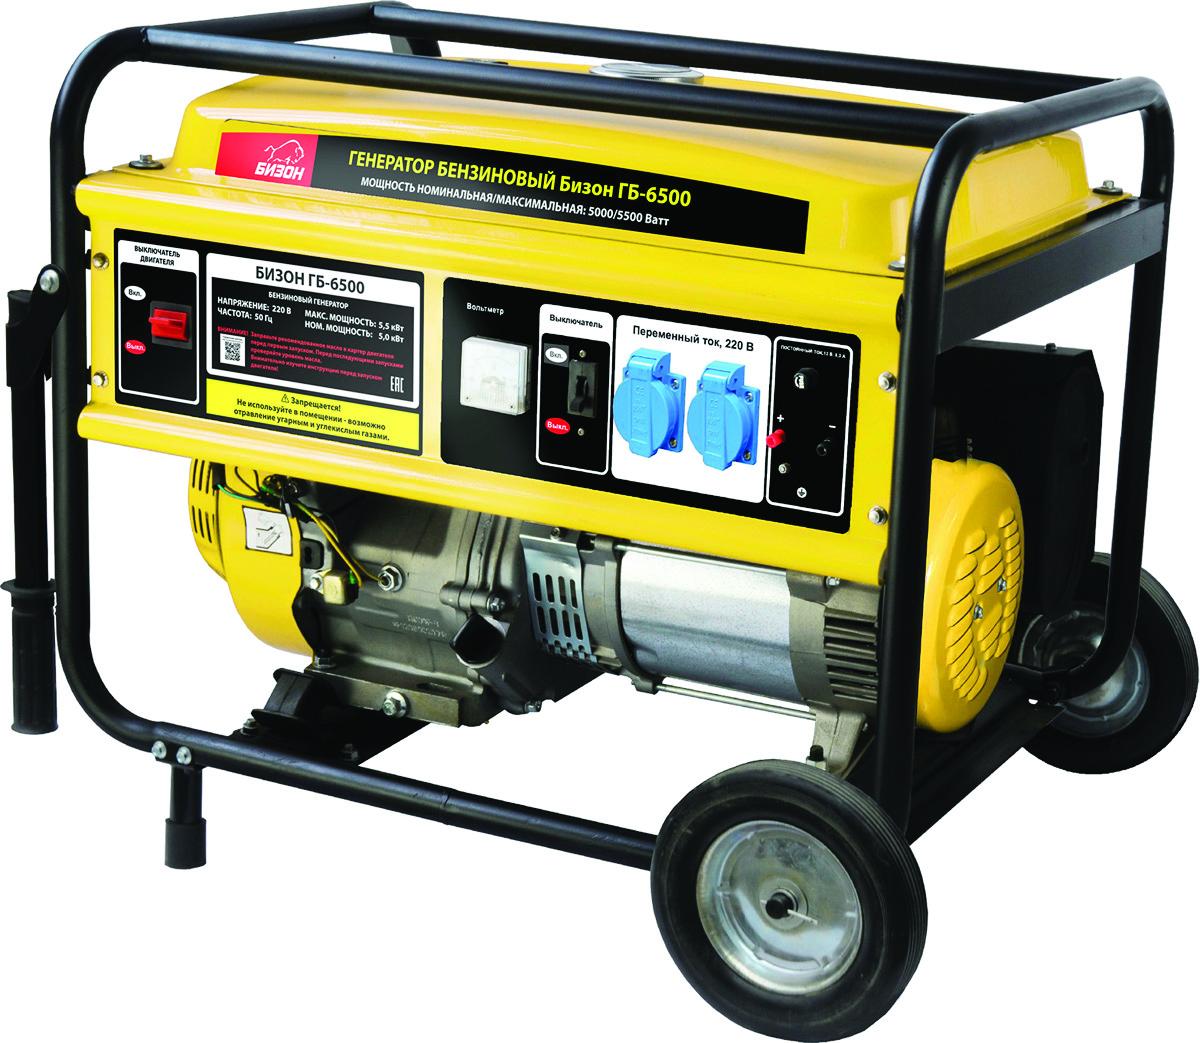 Генератор бензиновый Бизон-6500, бак 25 л